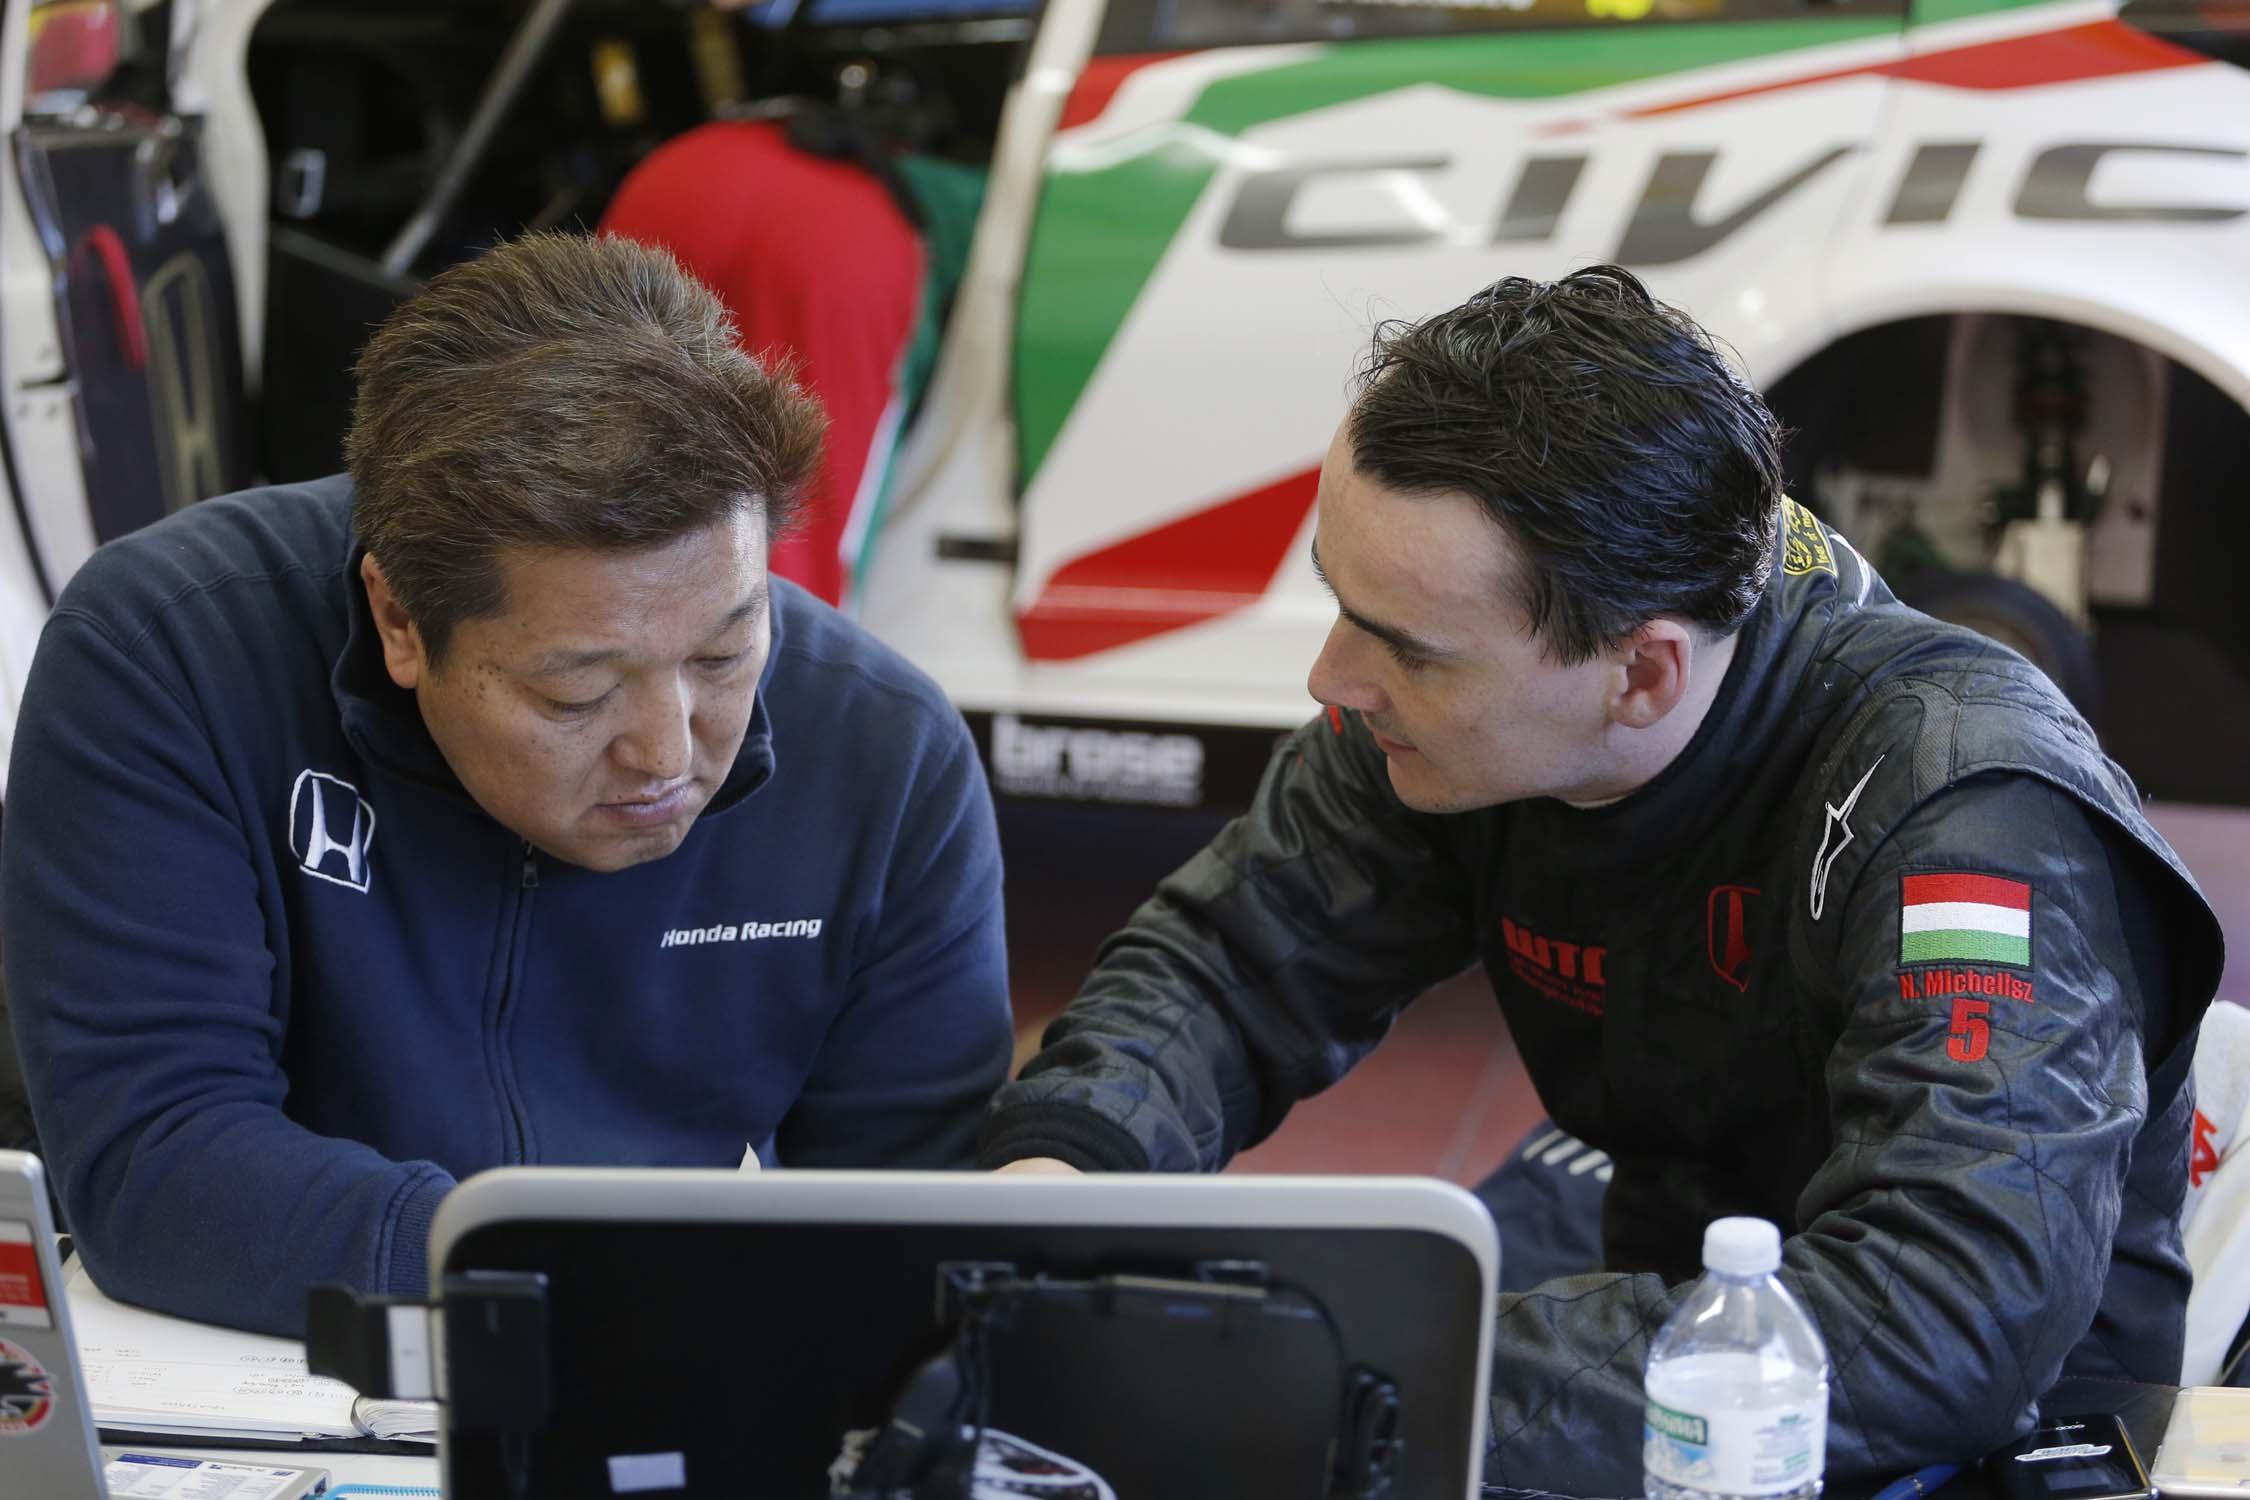 FIA World Touring Car Championship 20116 - Mehdi Bennani WTCC Test Day action image